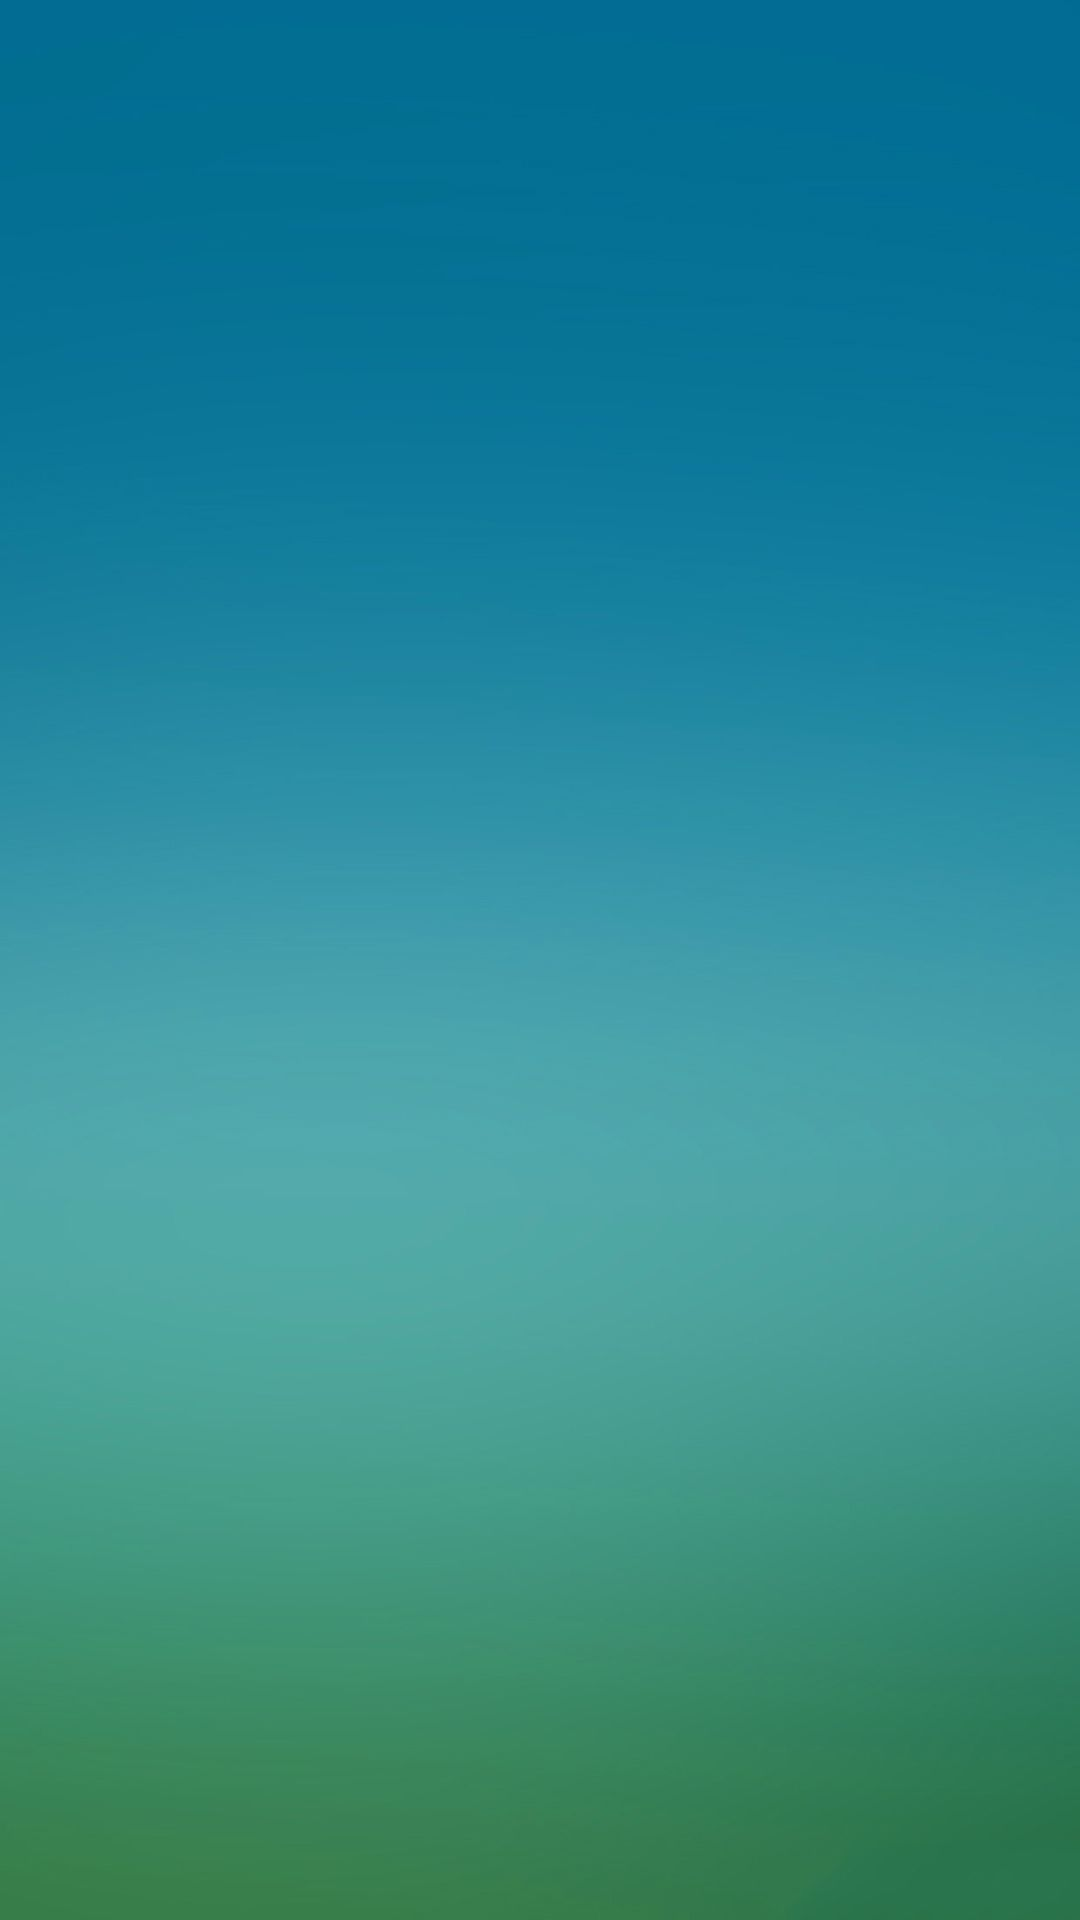 Blue Green Soft Gradation Blur Iphone 8 Wallpapers Dengan Gambar